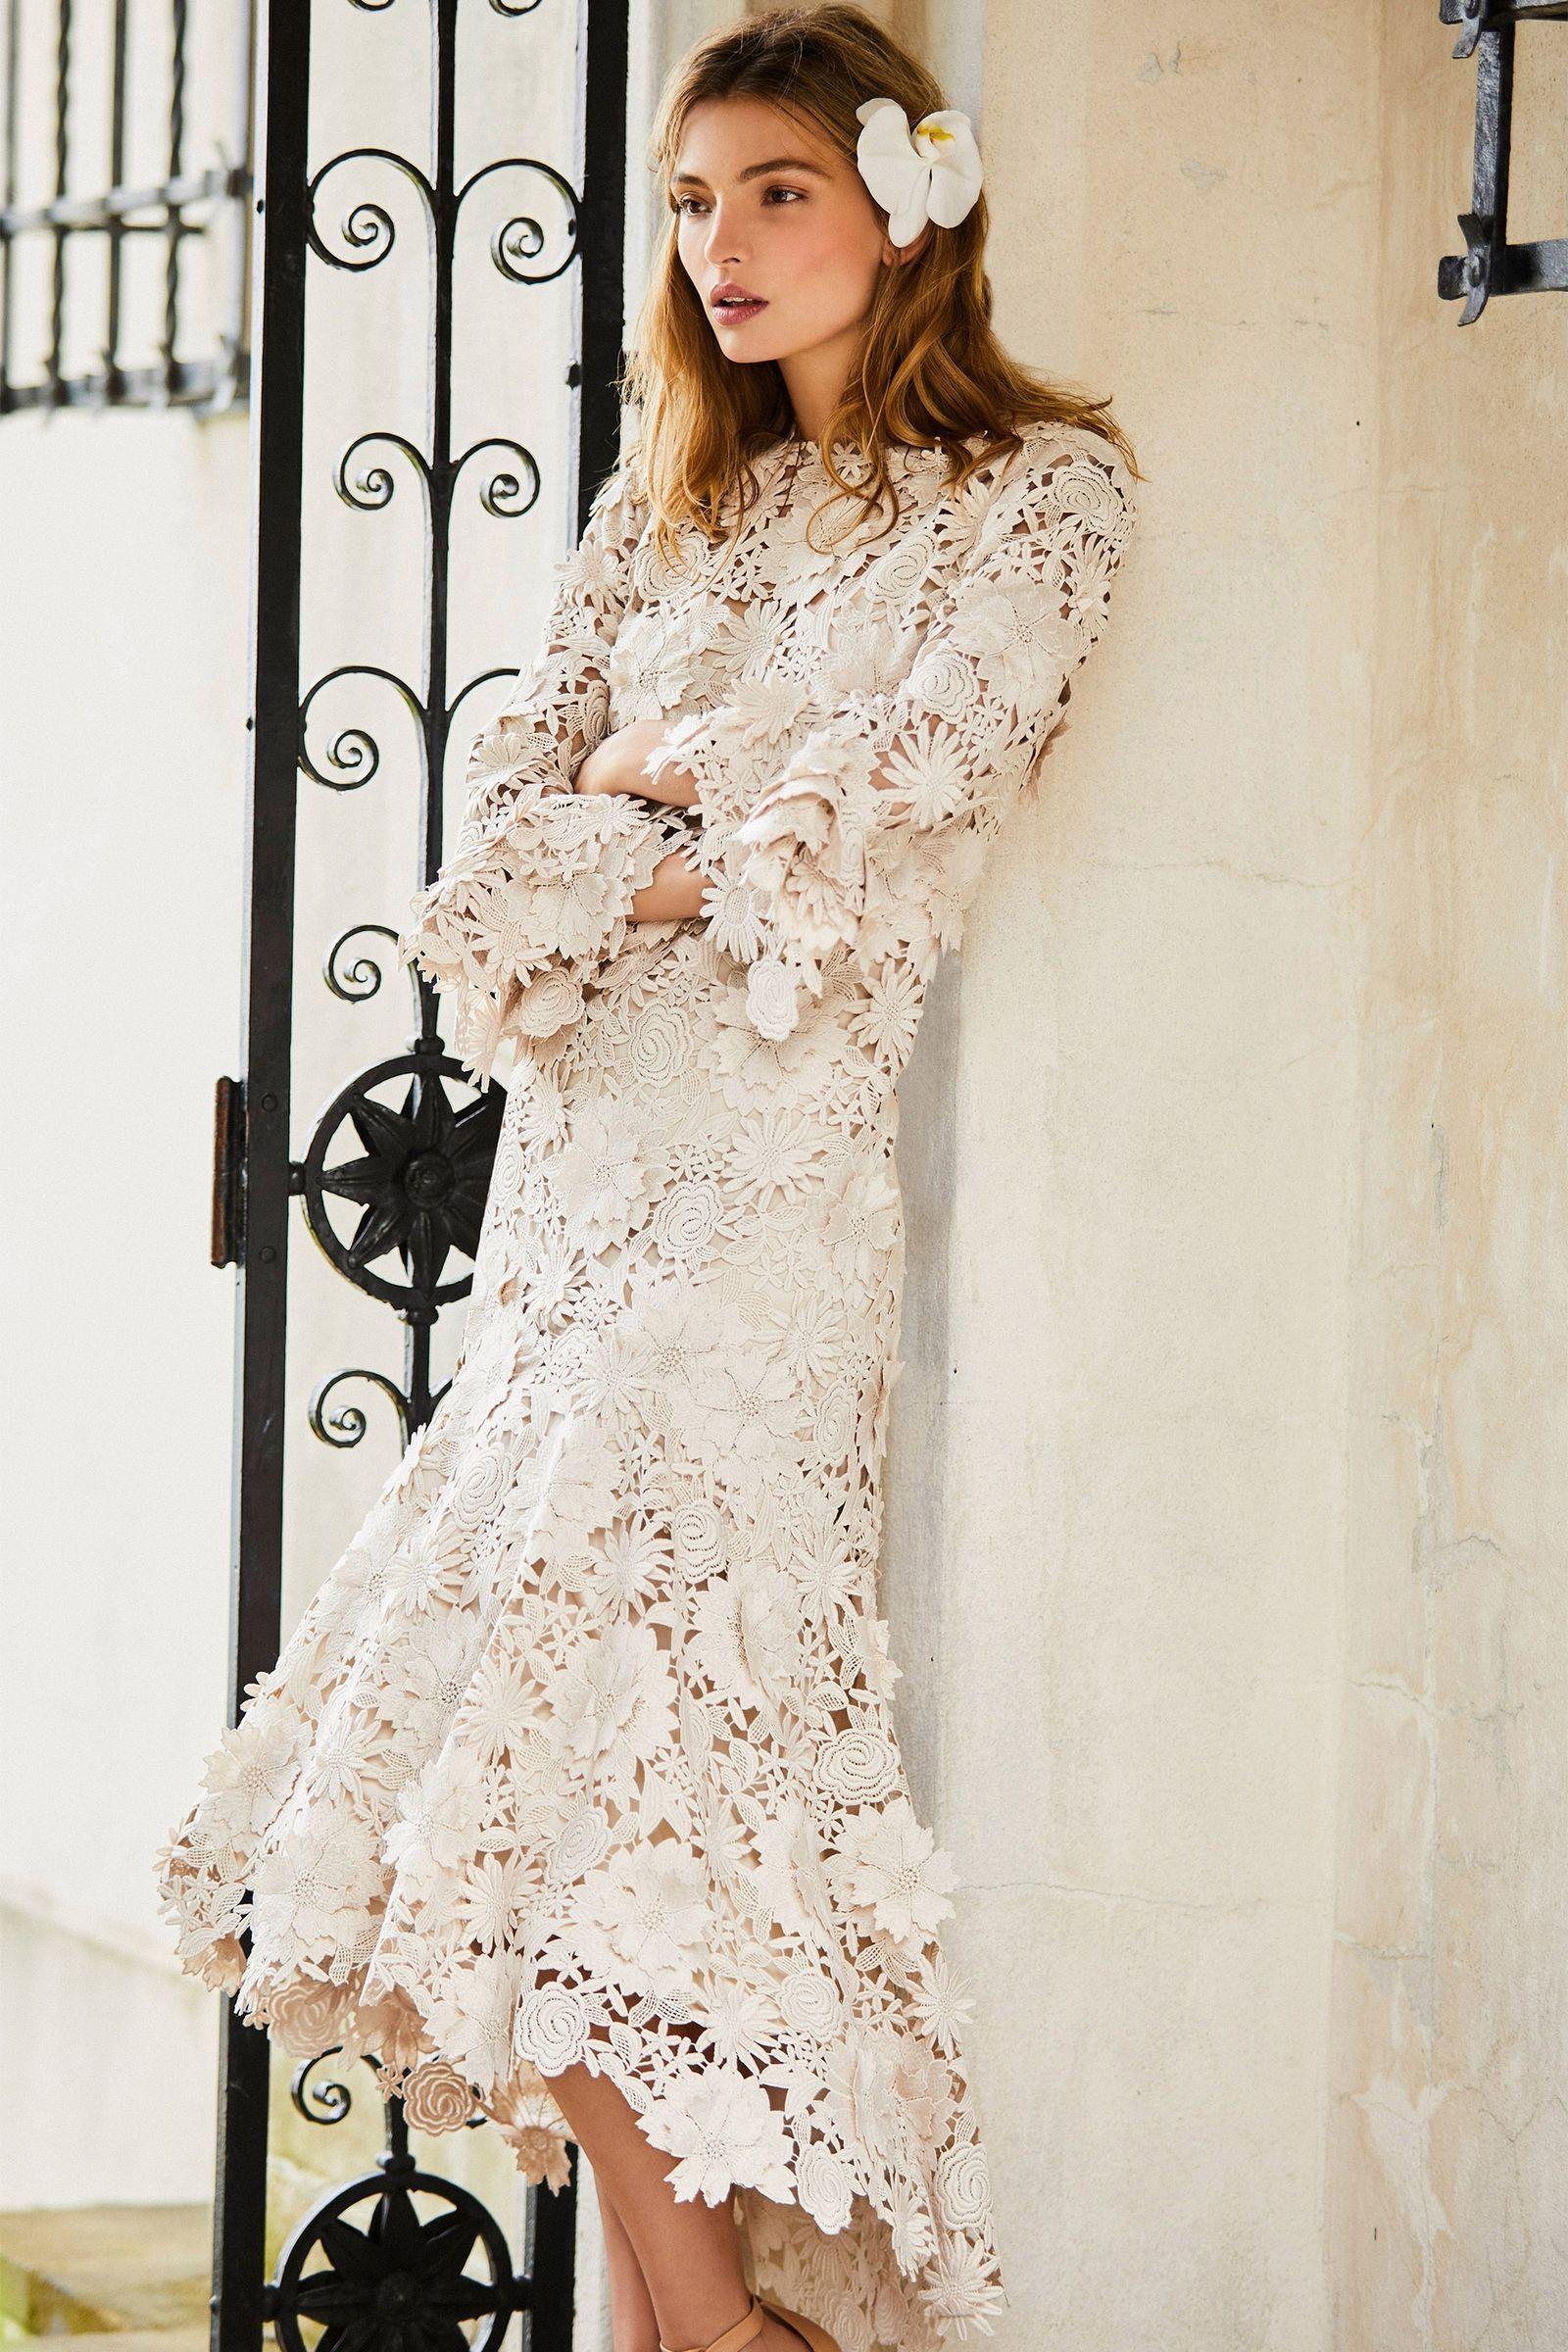 effortless looks for the boho bride boho wedding dress and